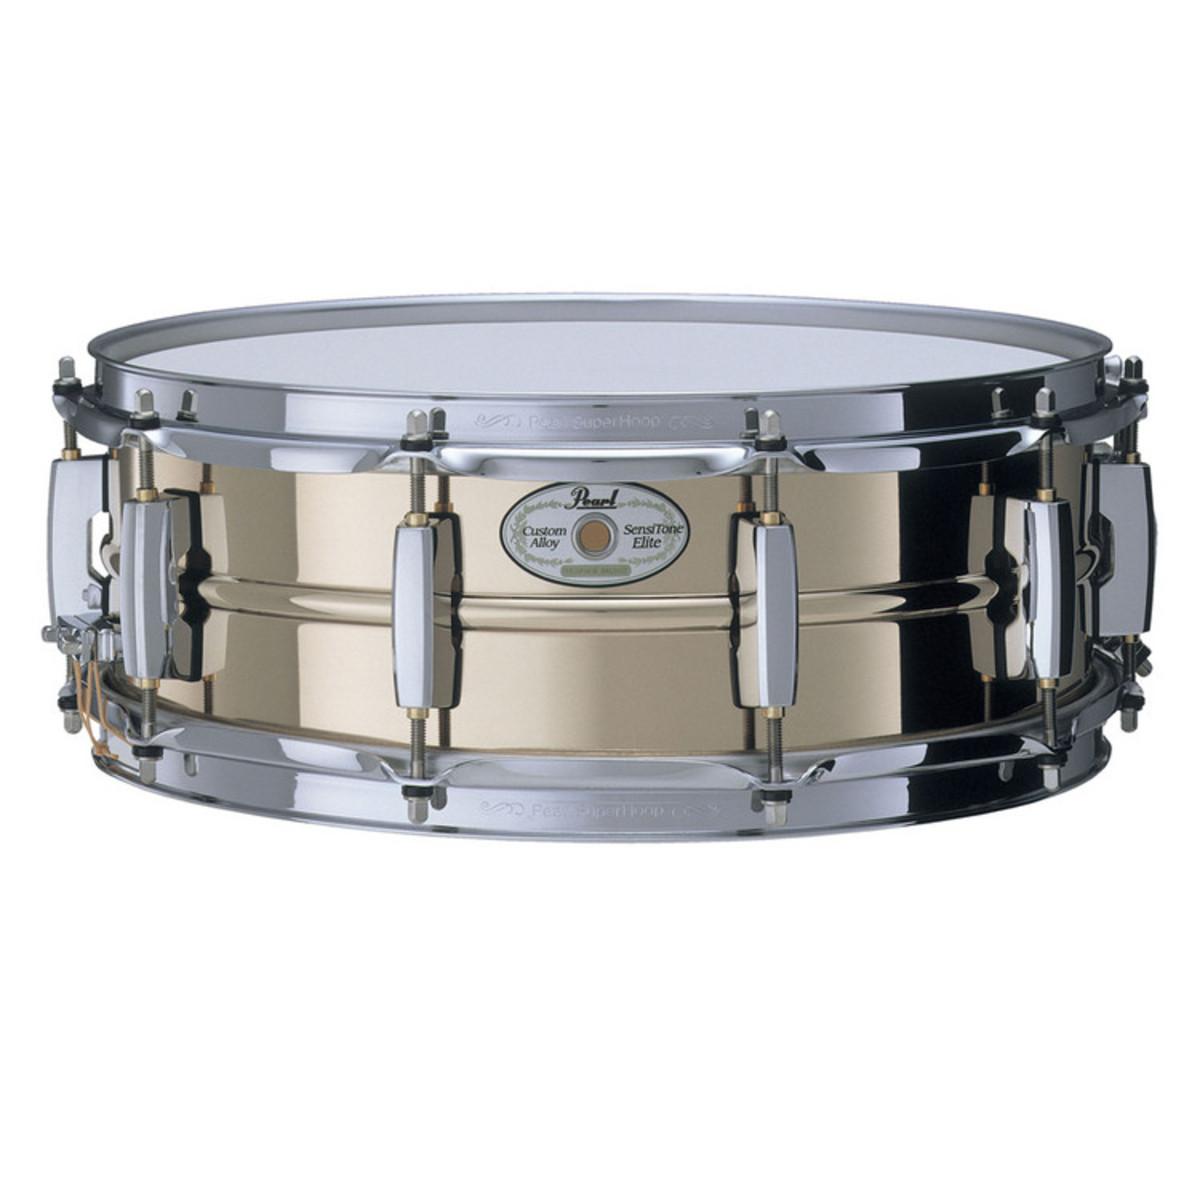 disc pearl sensitone elite 14 39 39 x 5 39 39 snare drum phosphor bronze gear4music. Black Bedroom Furniture Sets. Home Design Ideas